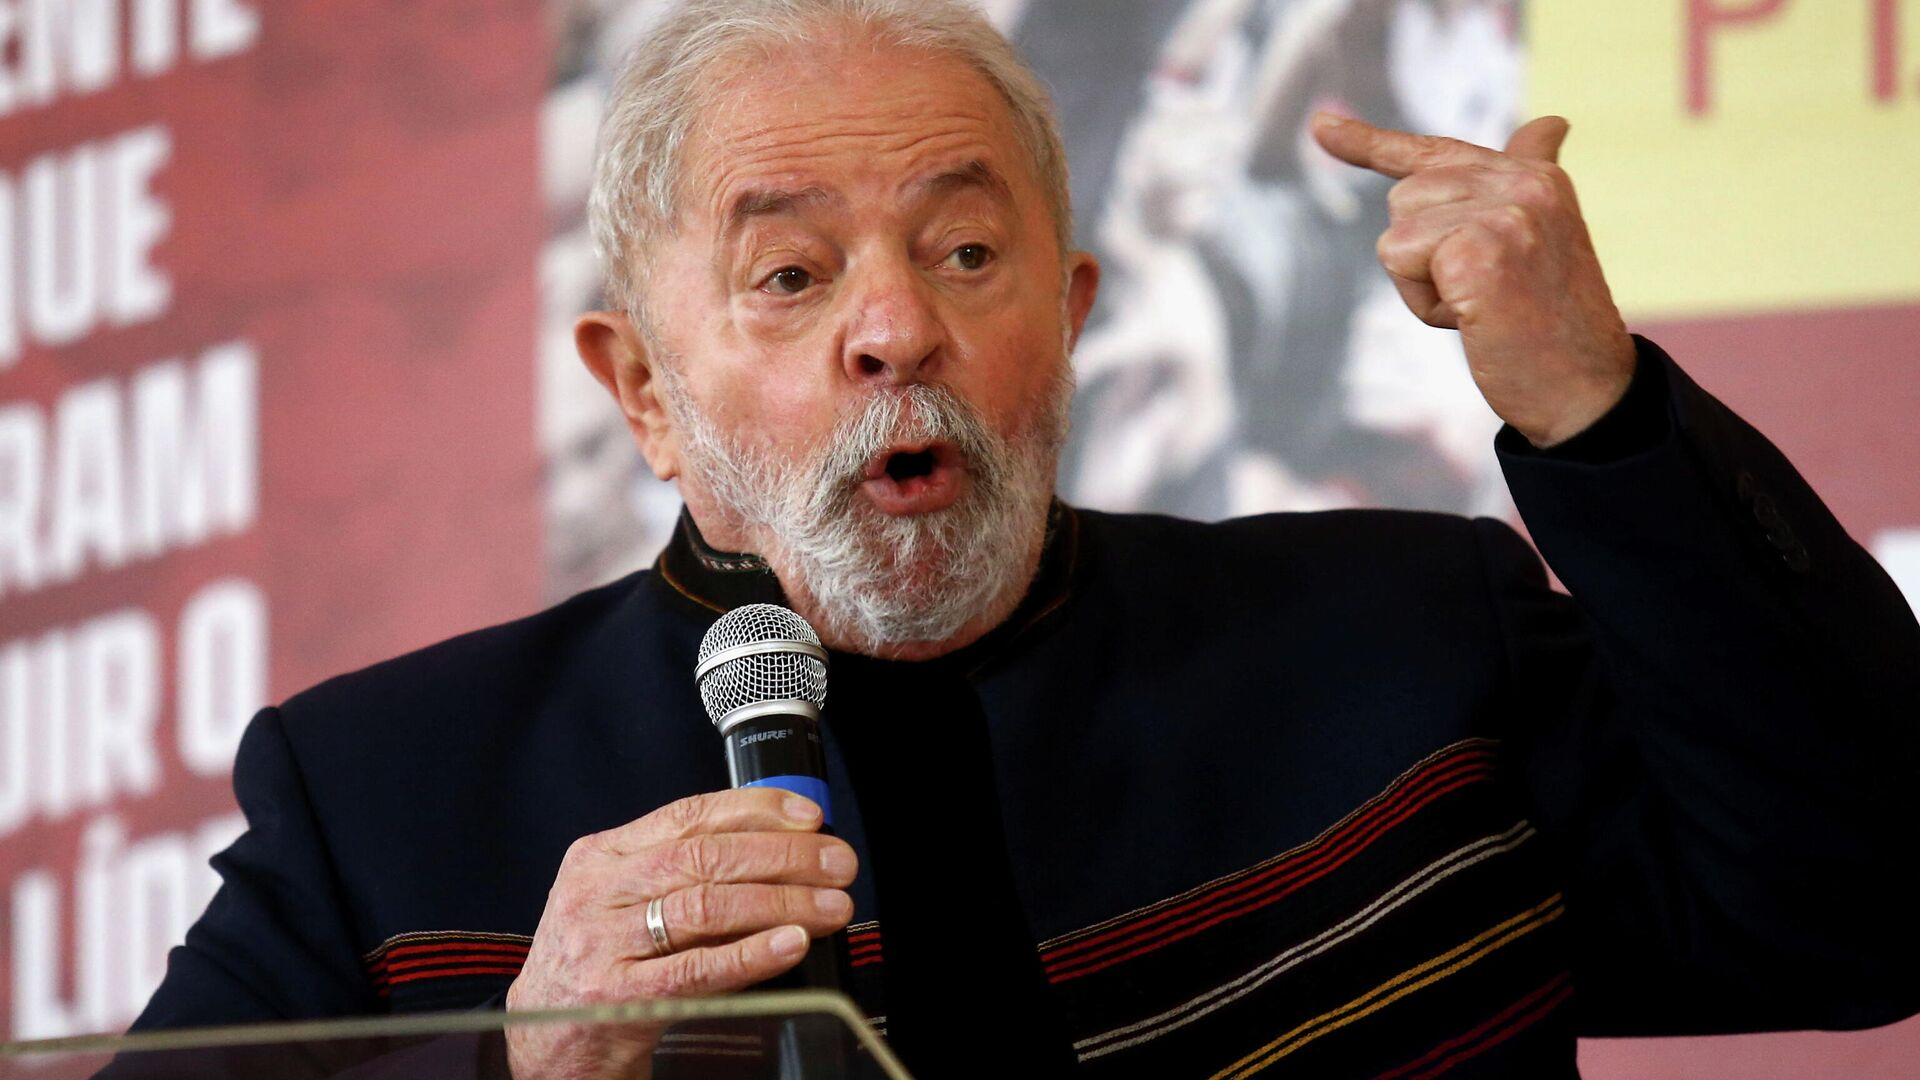 El expresidente de Brasil Luiz Inacio Lula da Silva - Sputnik Mundo, 1920, 06.09.2021